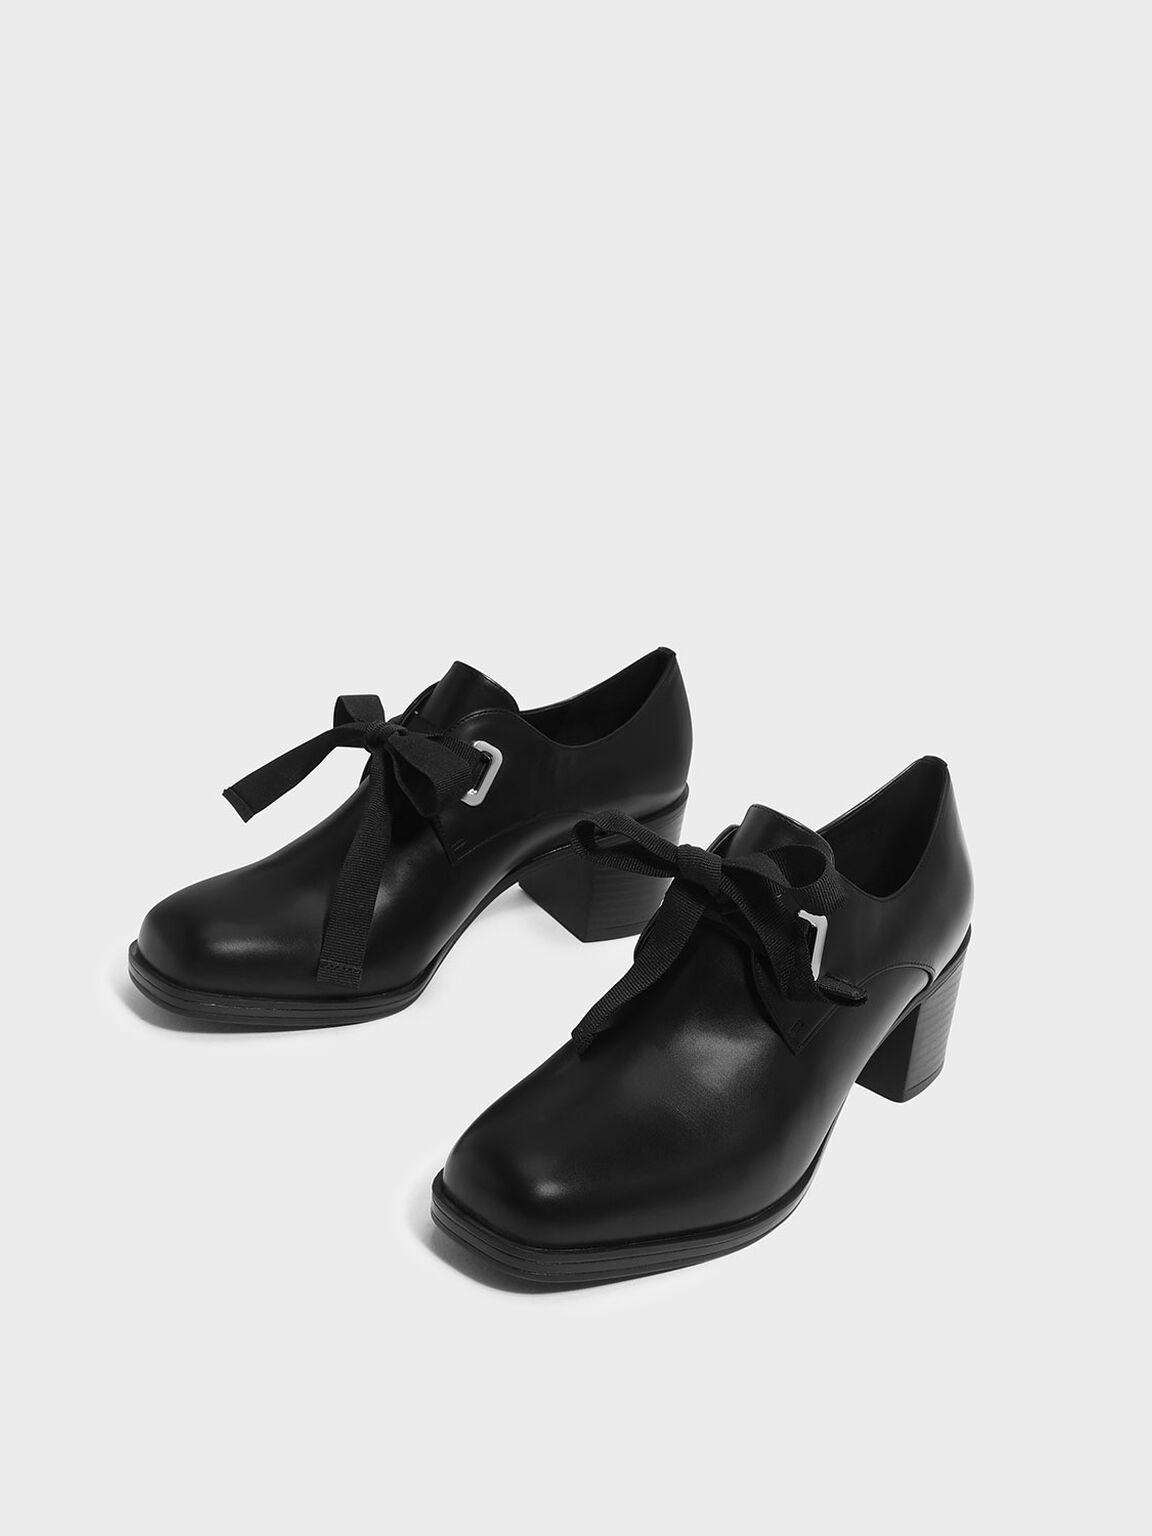 Stacked Heel Oxfords, Black, hi-res